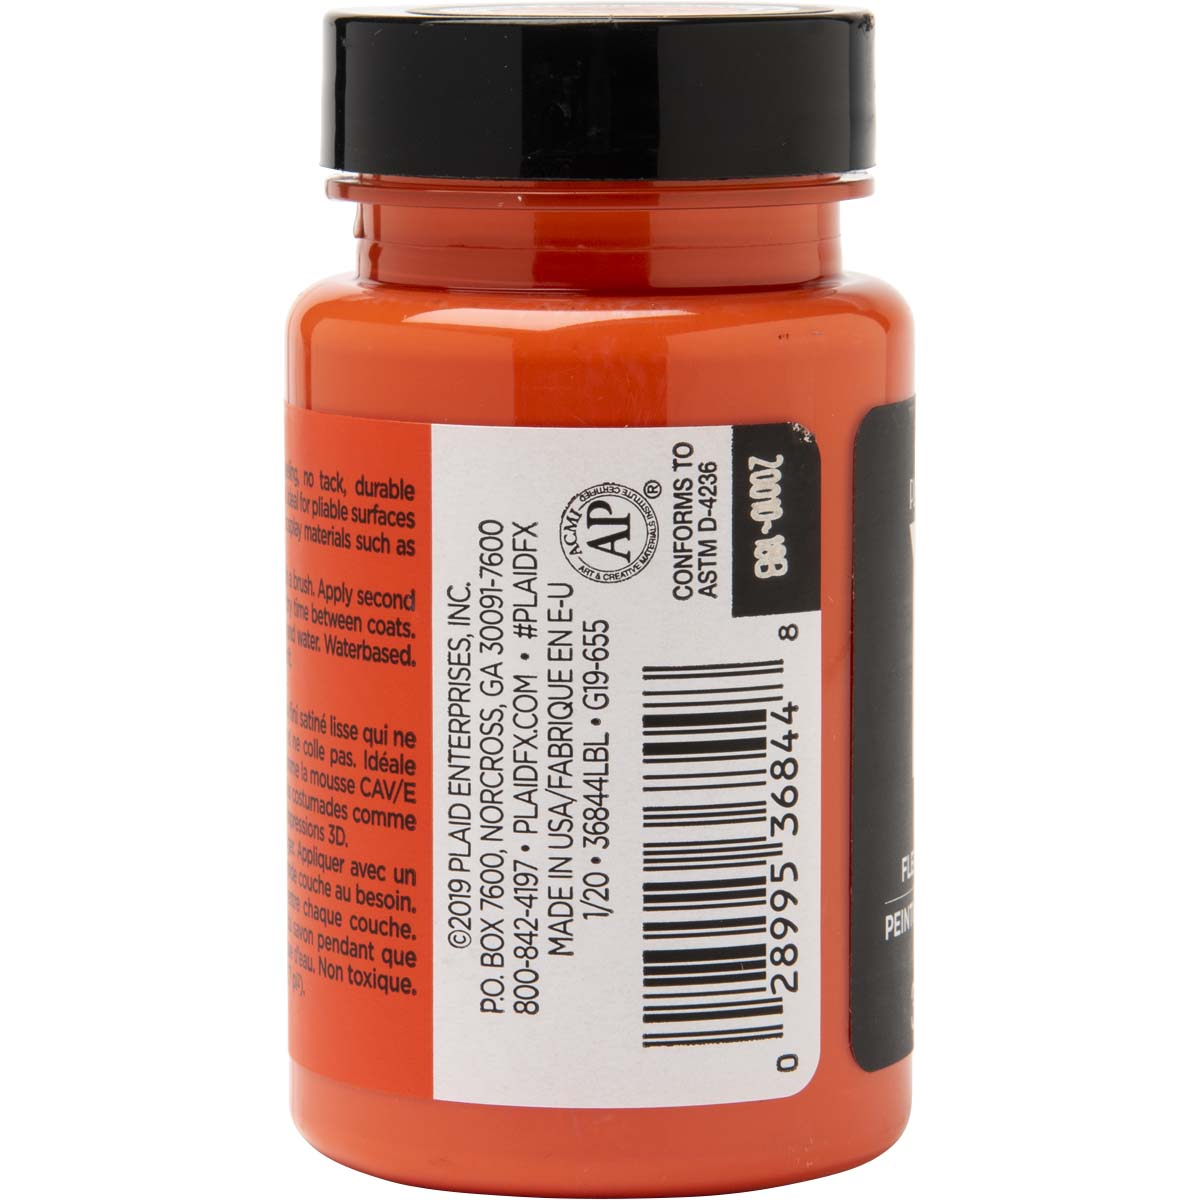 PlaidFX Smooth Satin Flexible Acrylic Paint - Orbital Orange, 3 oz. - 36844